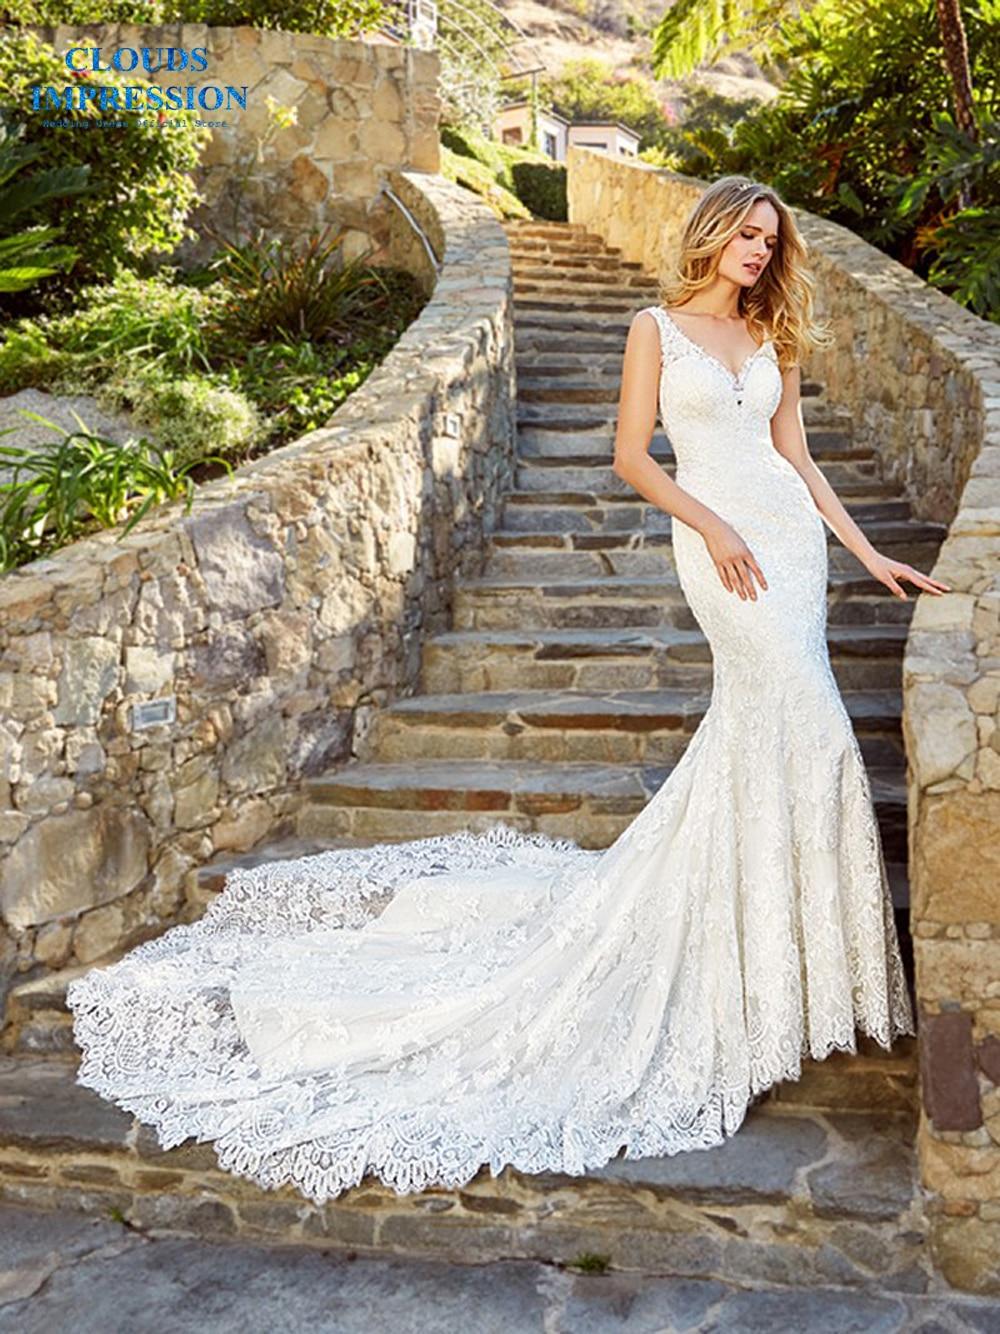 CLOUDS IMPRESSION Sexy V-neck 2019 Lace Mermaid Wedding Dress Button Illusion Vestige De Noiva Bridal Dresses Bridal Gow